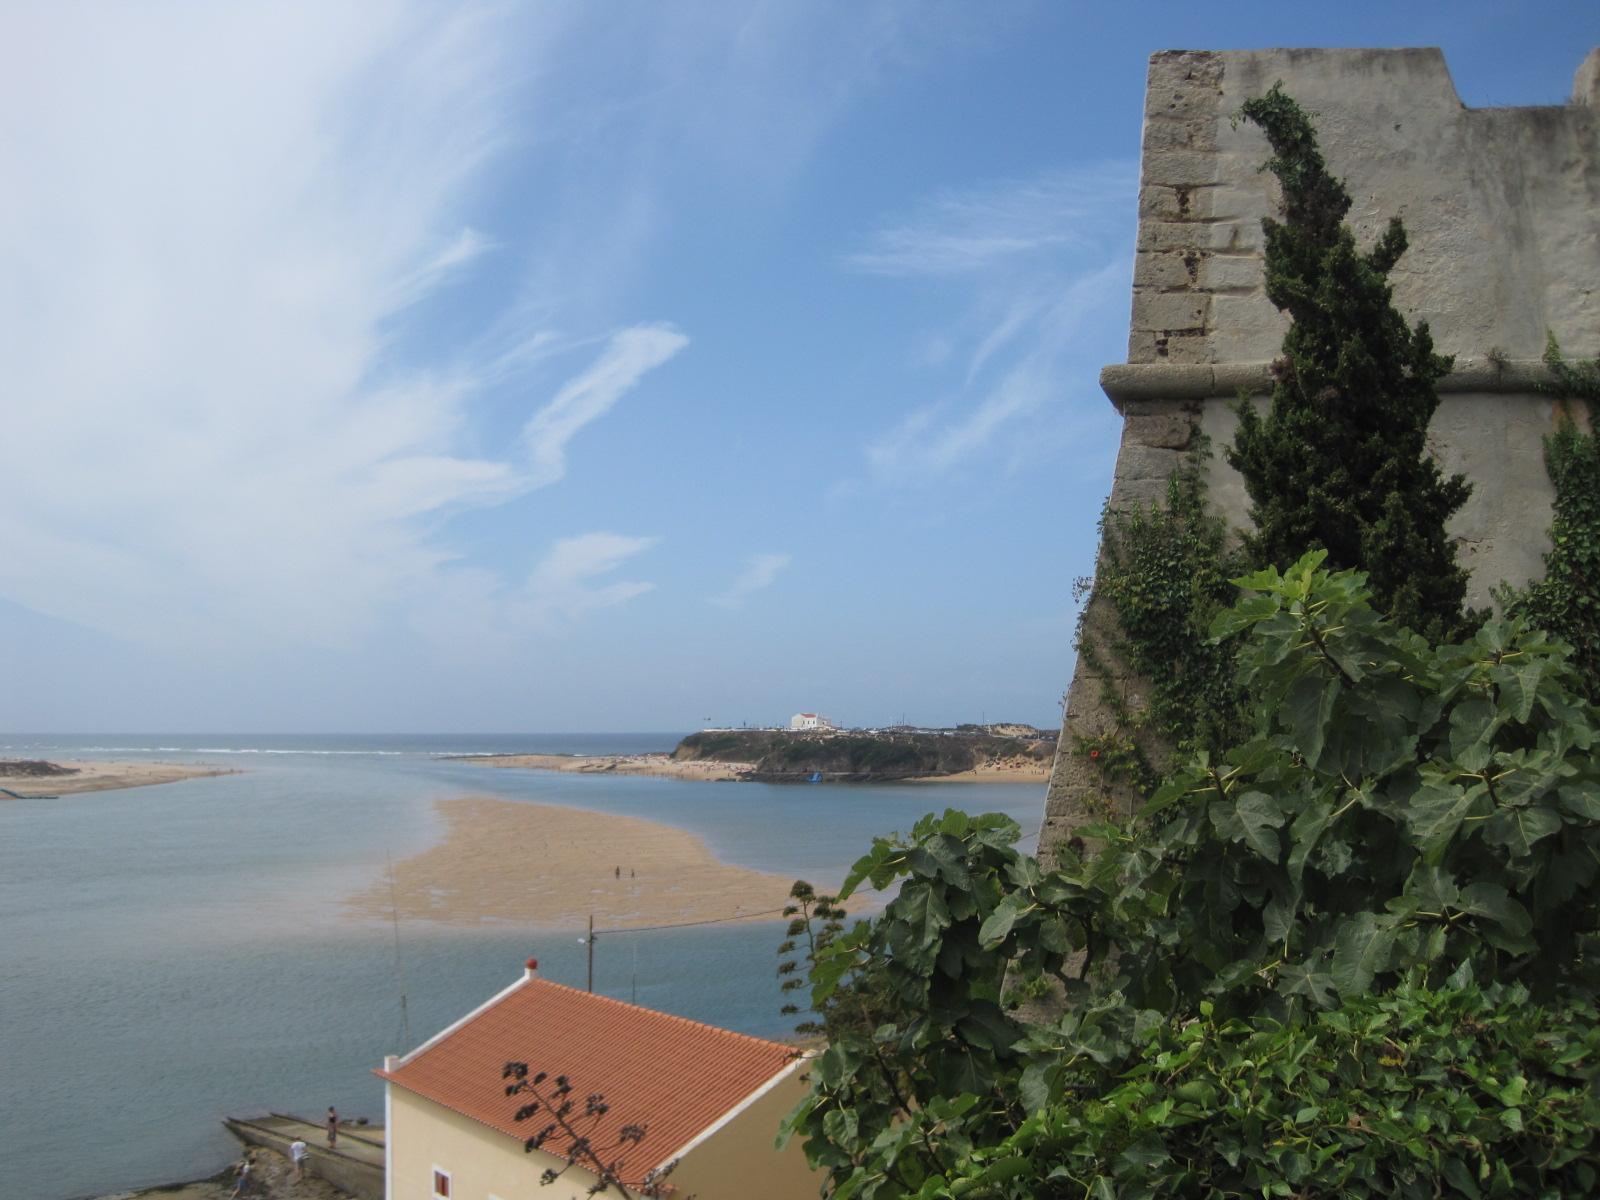 Looking down from the castelo at Vila Nova de Milfontes